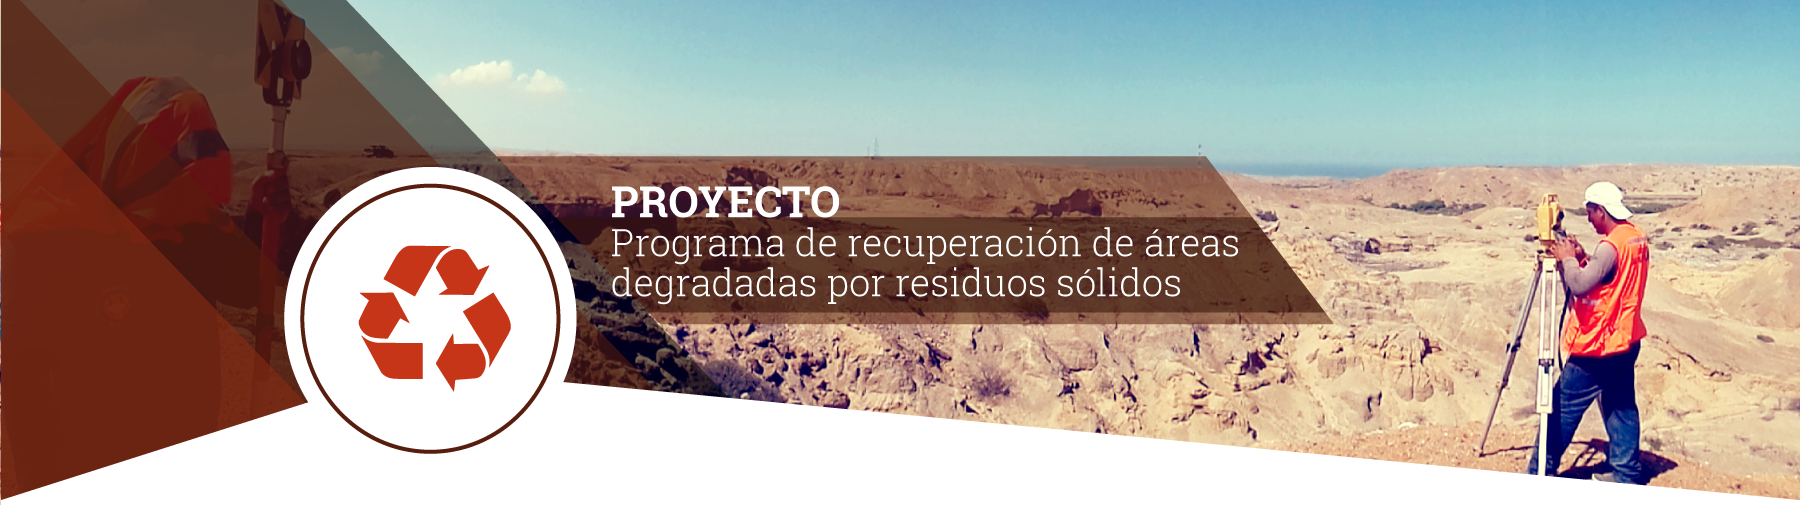 proyecto1-2